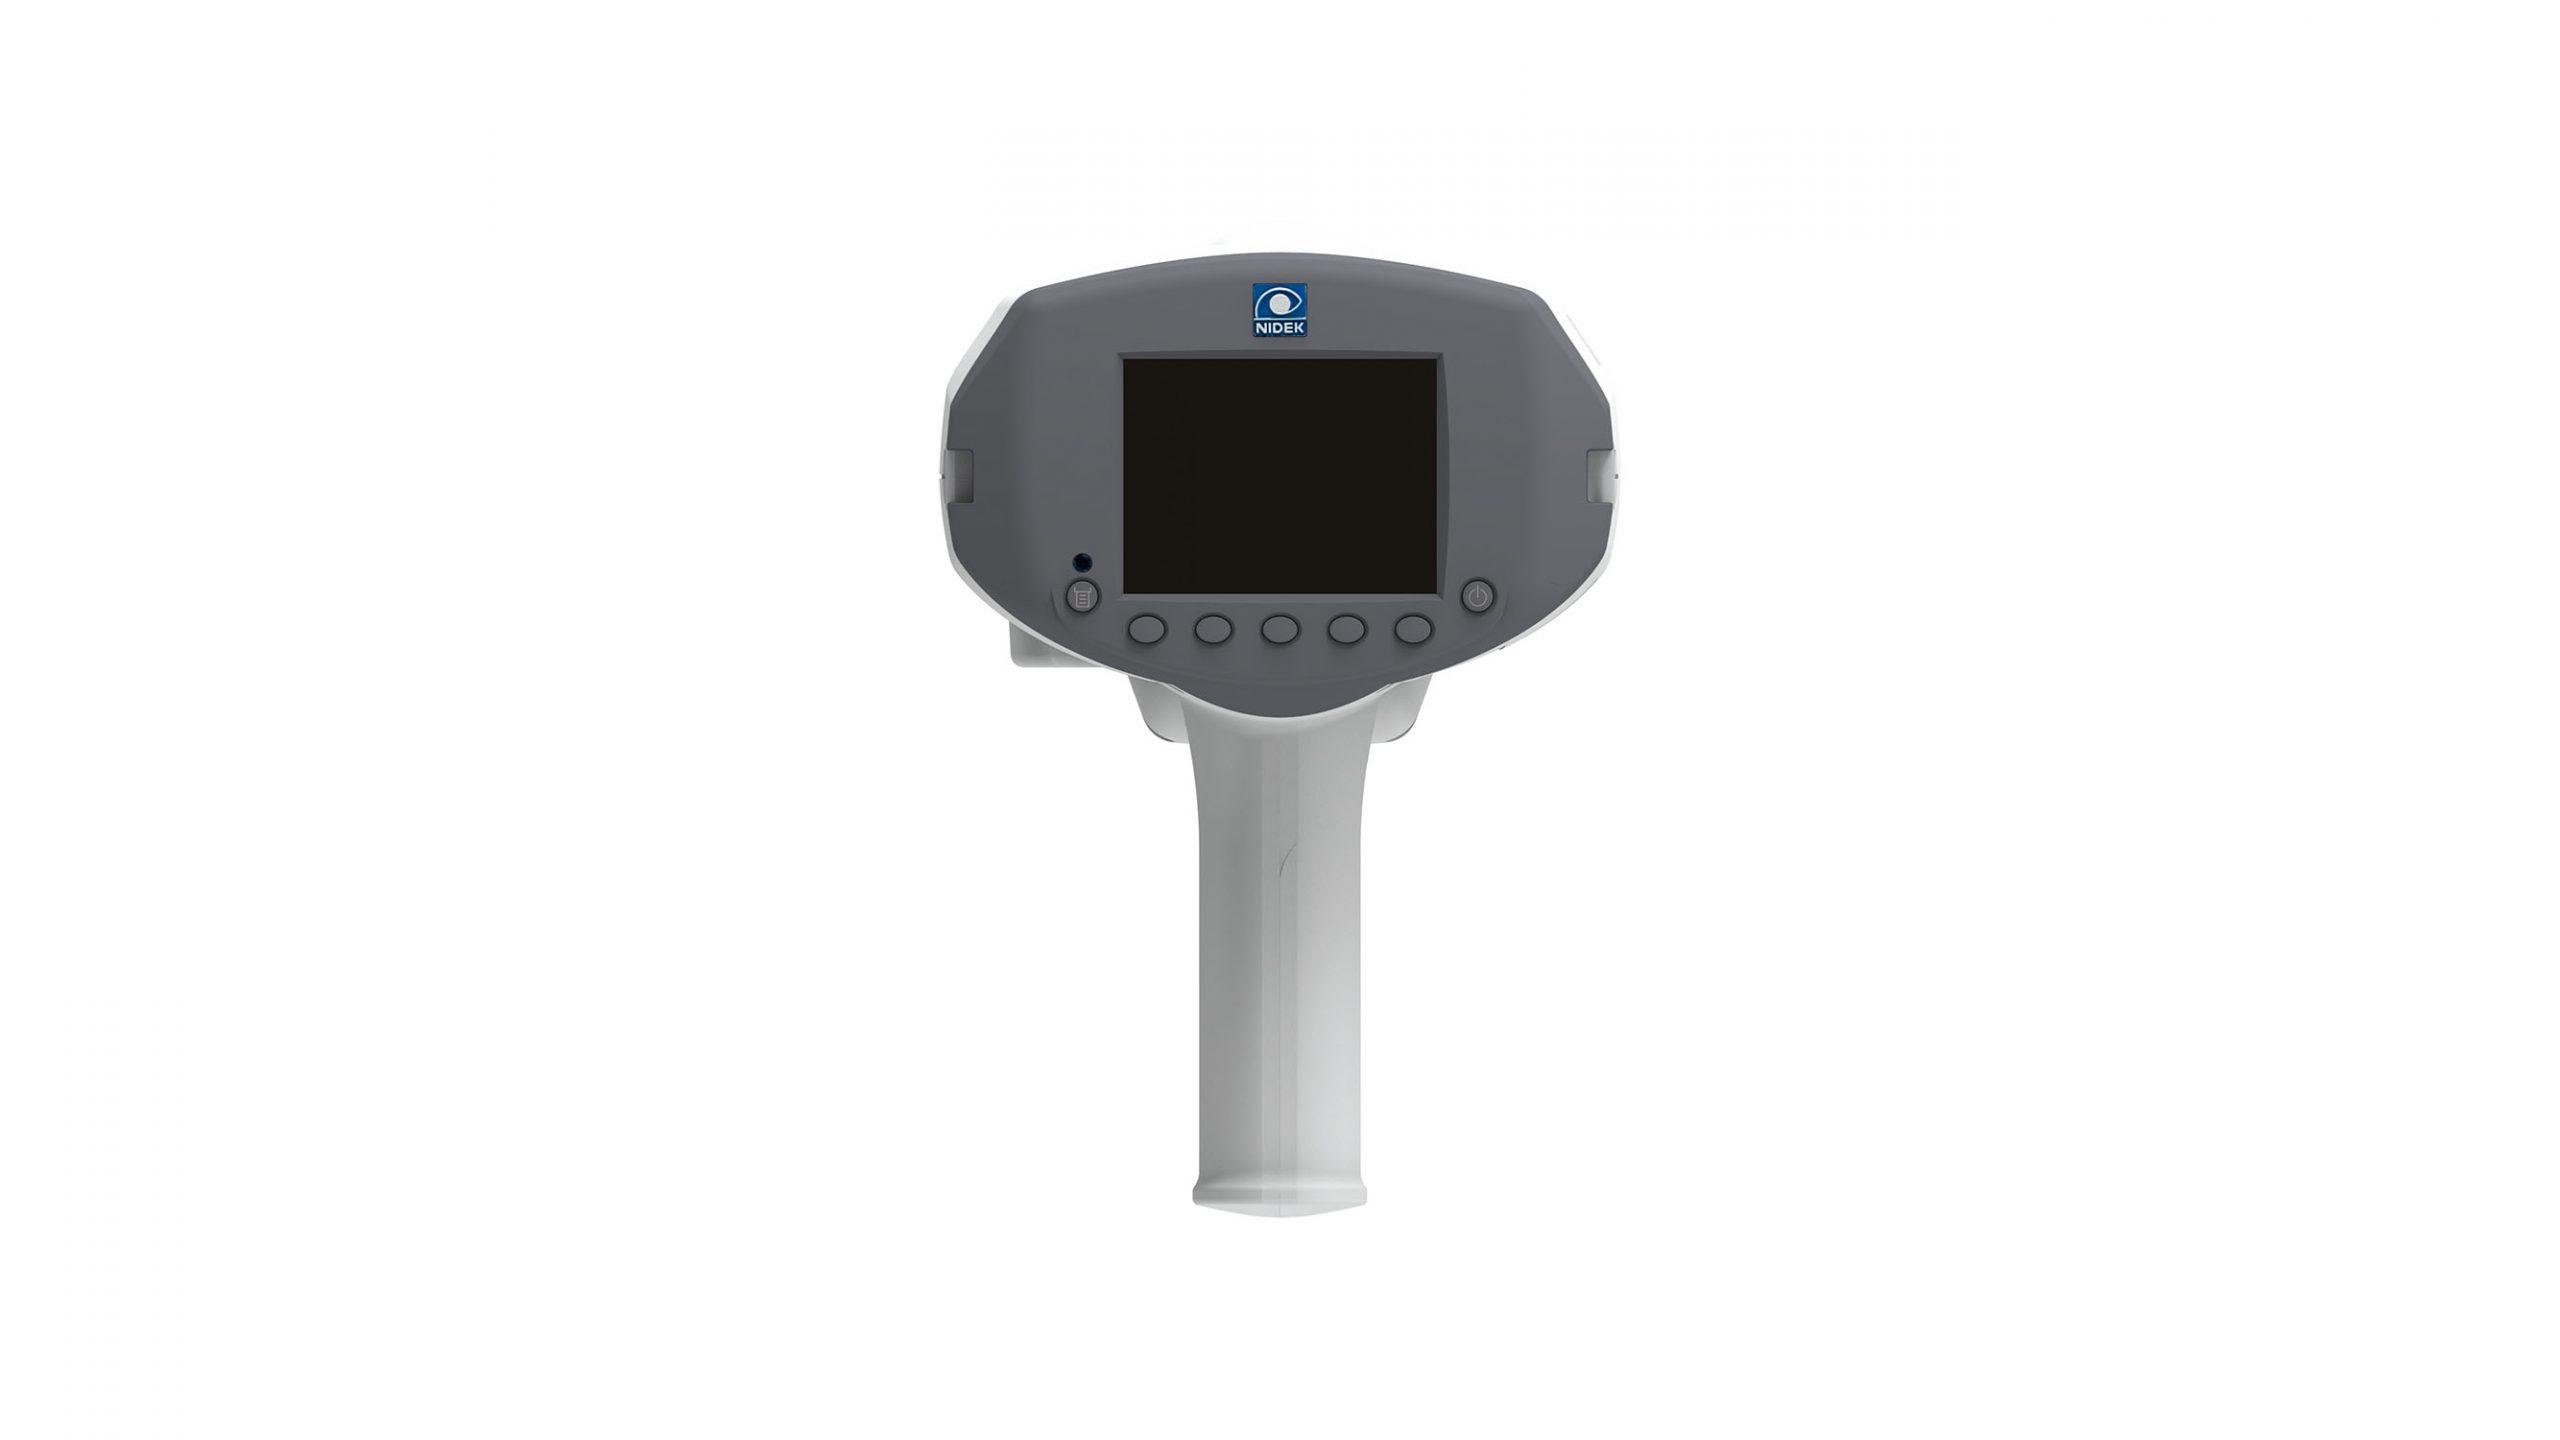 https://www.lameris-group.nl/wp-content/uploads/2020/03/Nidek-HandyRef-Handheld-Refracto-kerato-meter-scaled.jpg